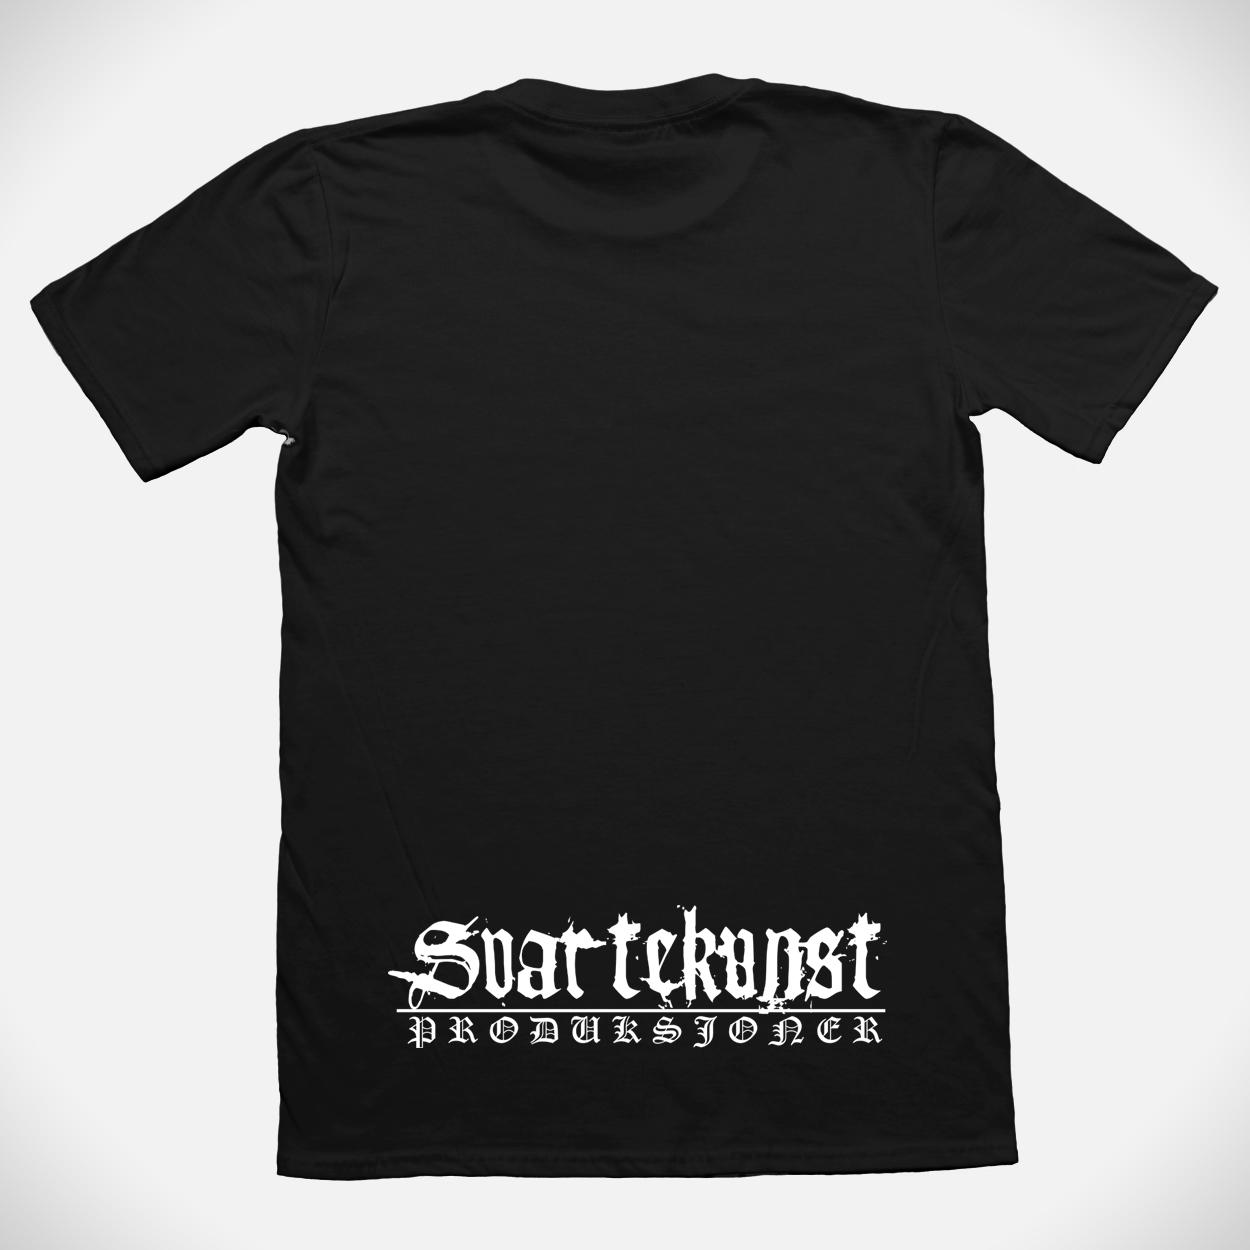 Taake t-shirt backprint